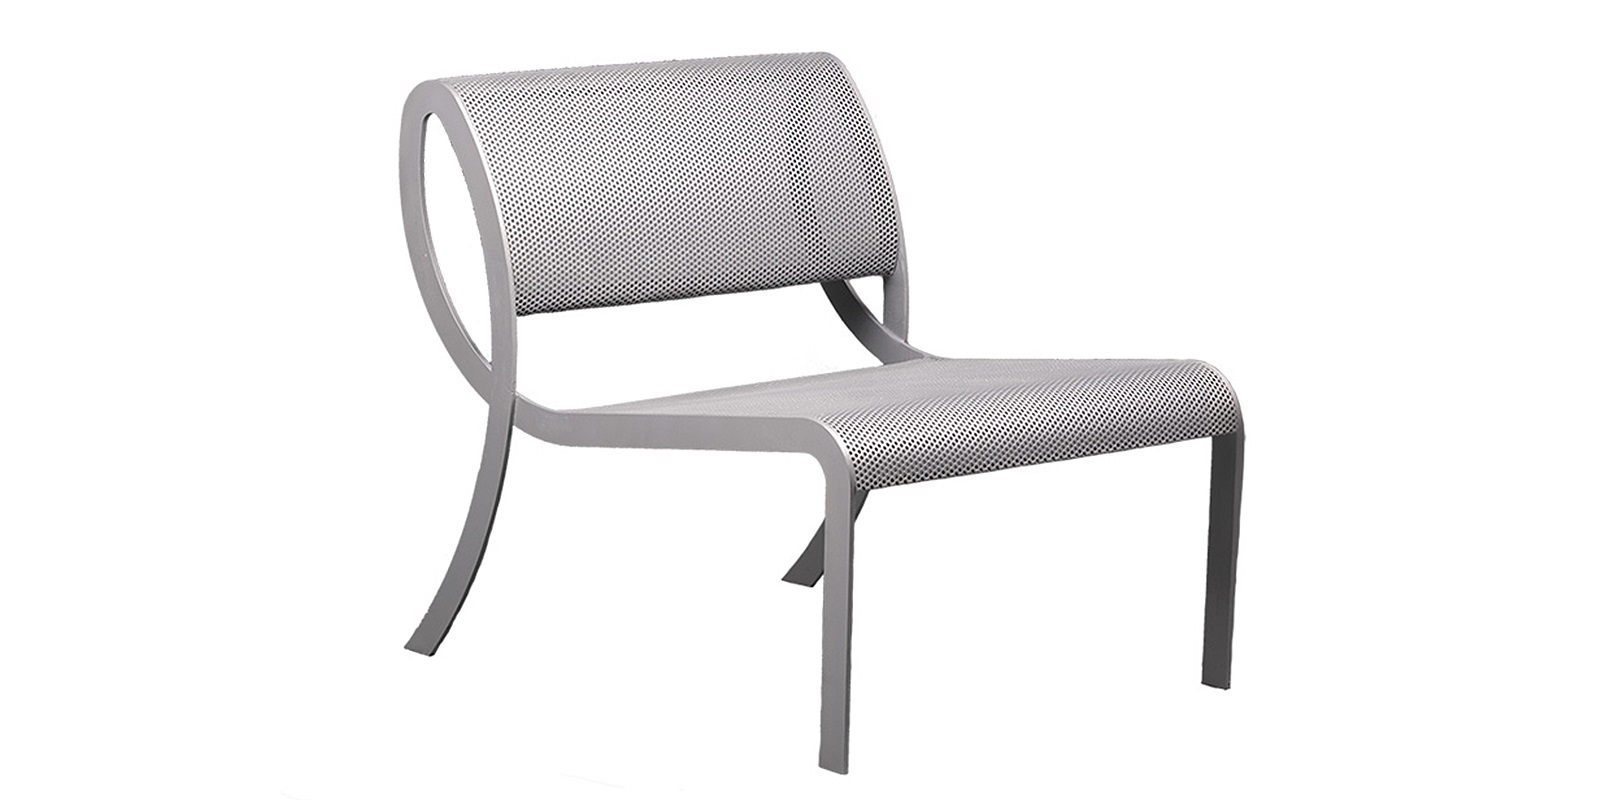 2-loop-chair-outdoor